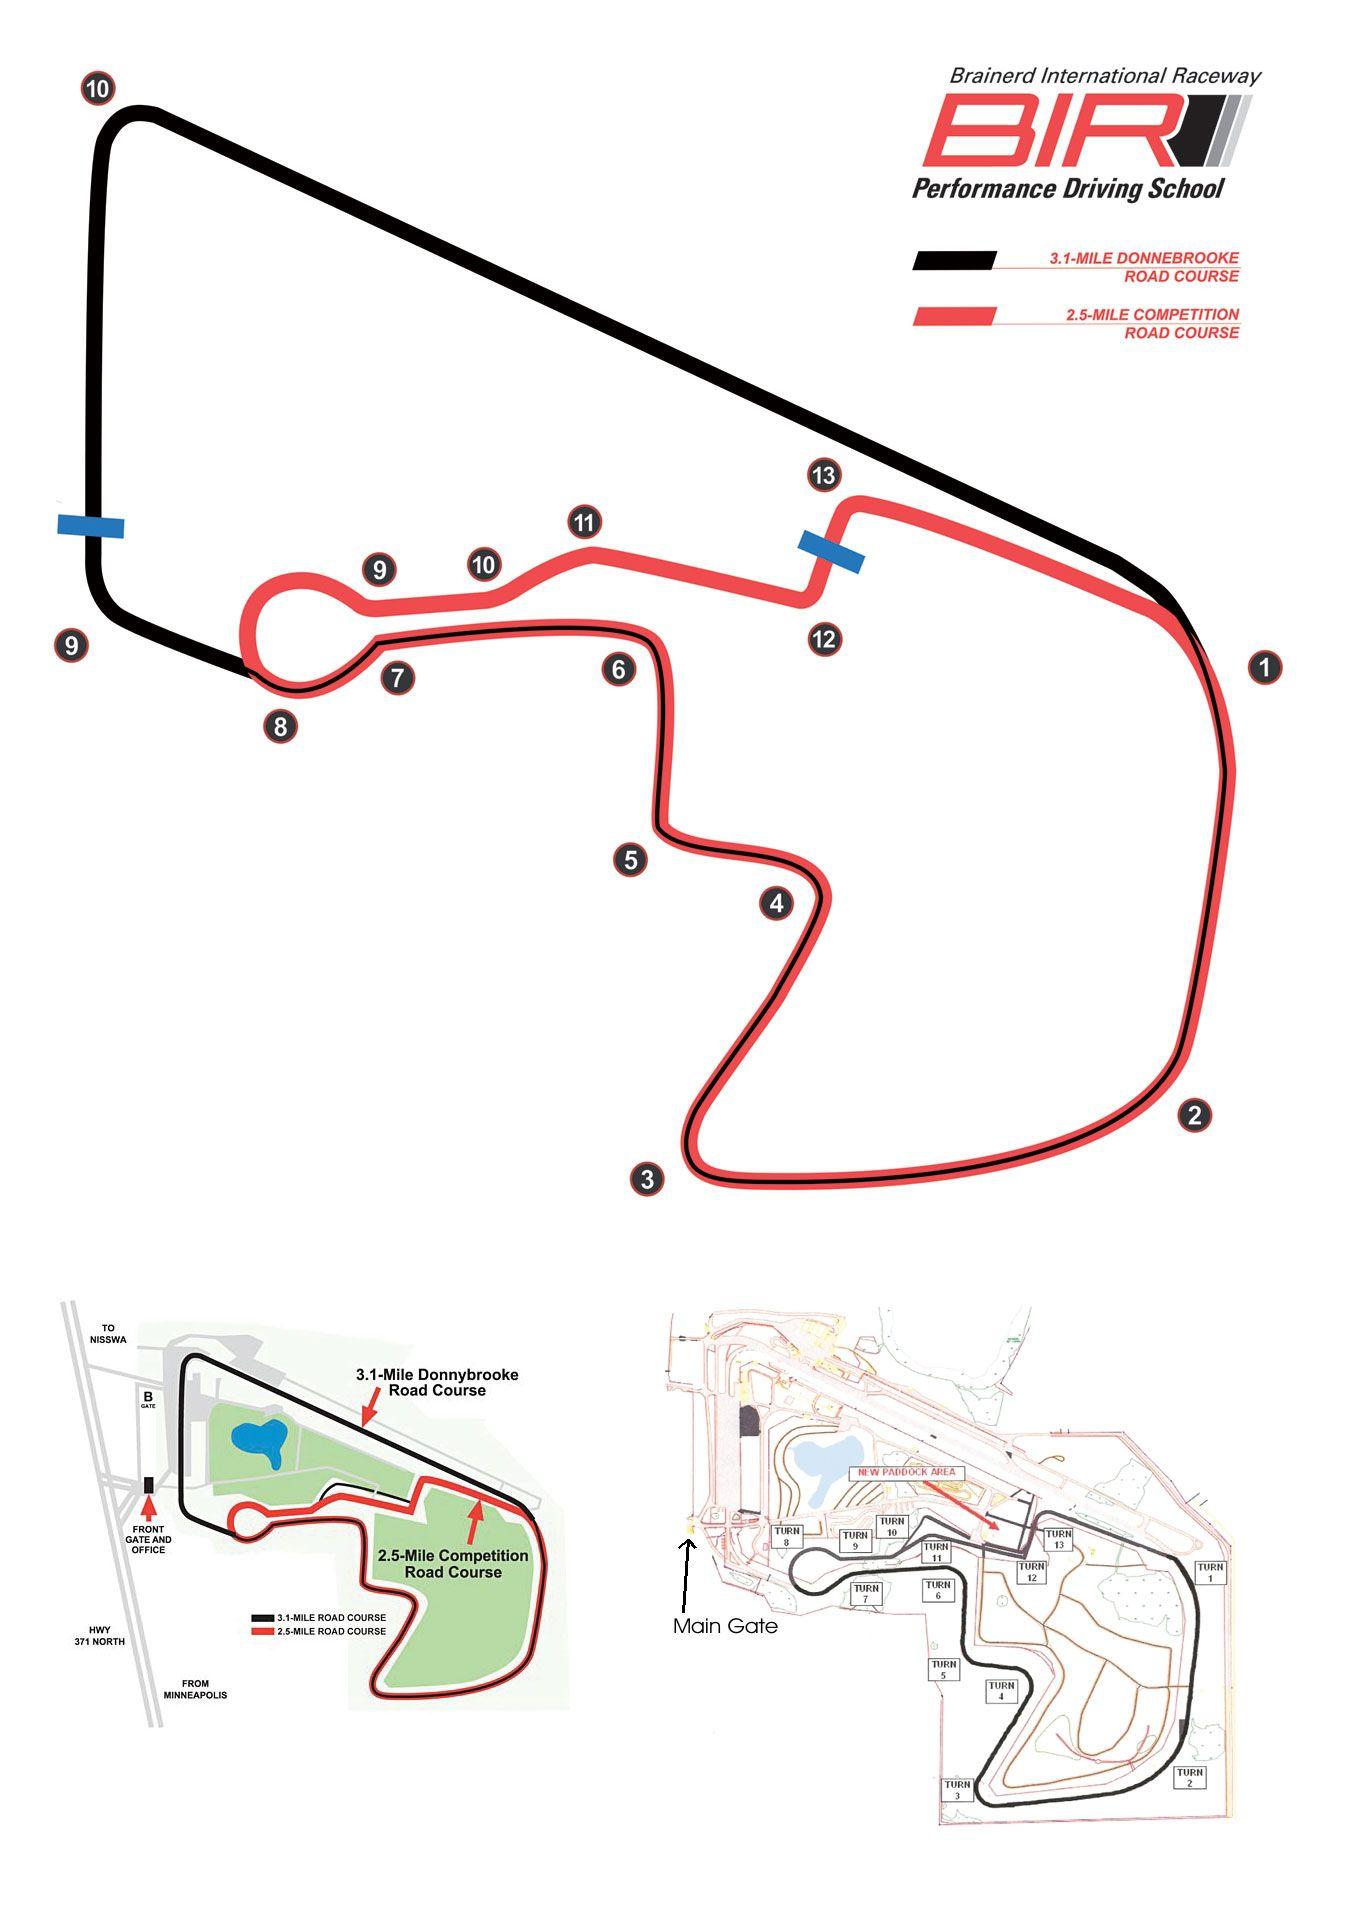 small resolution of brainerd international raceway track map